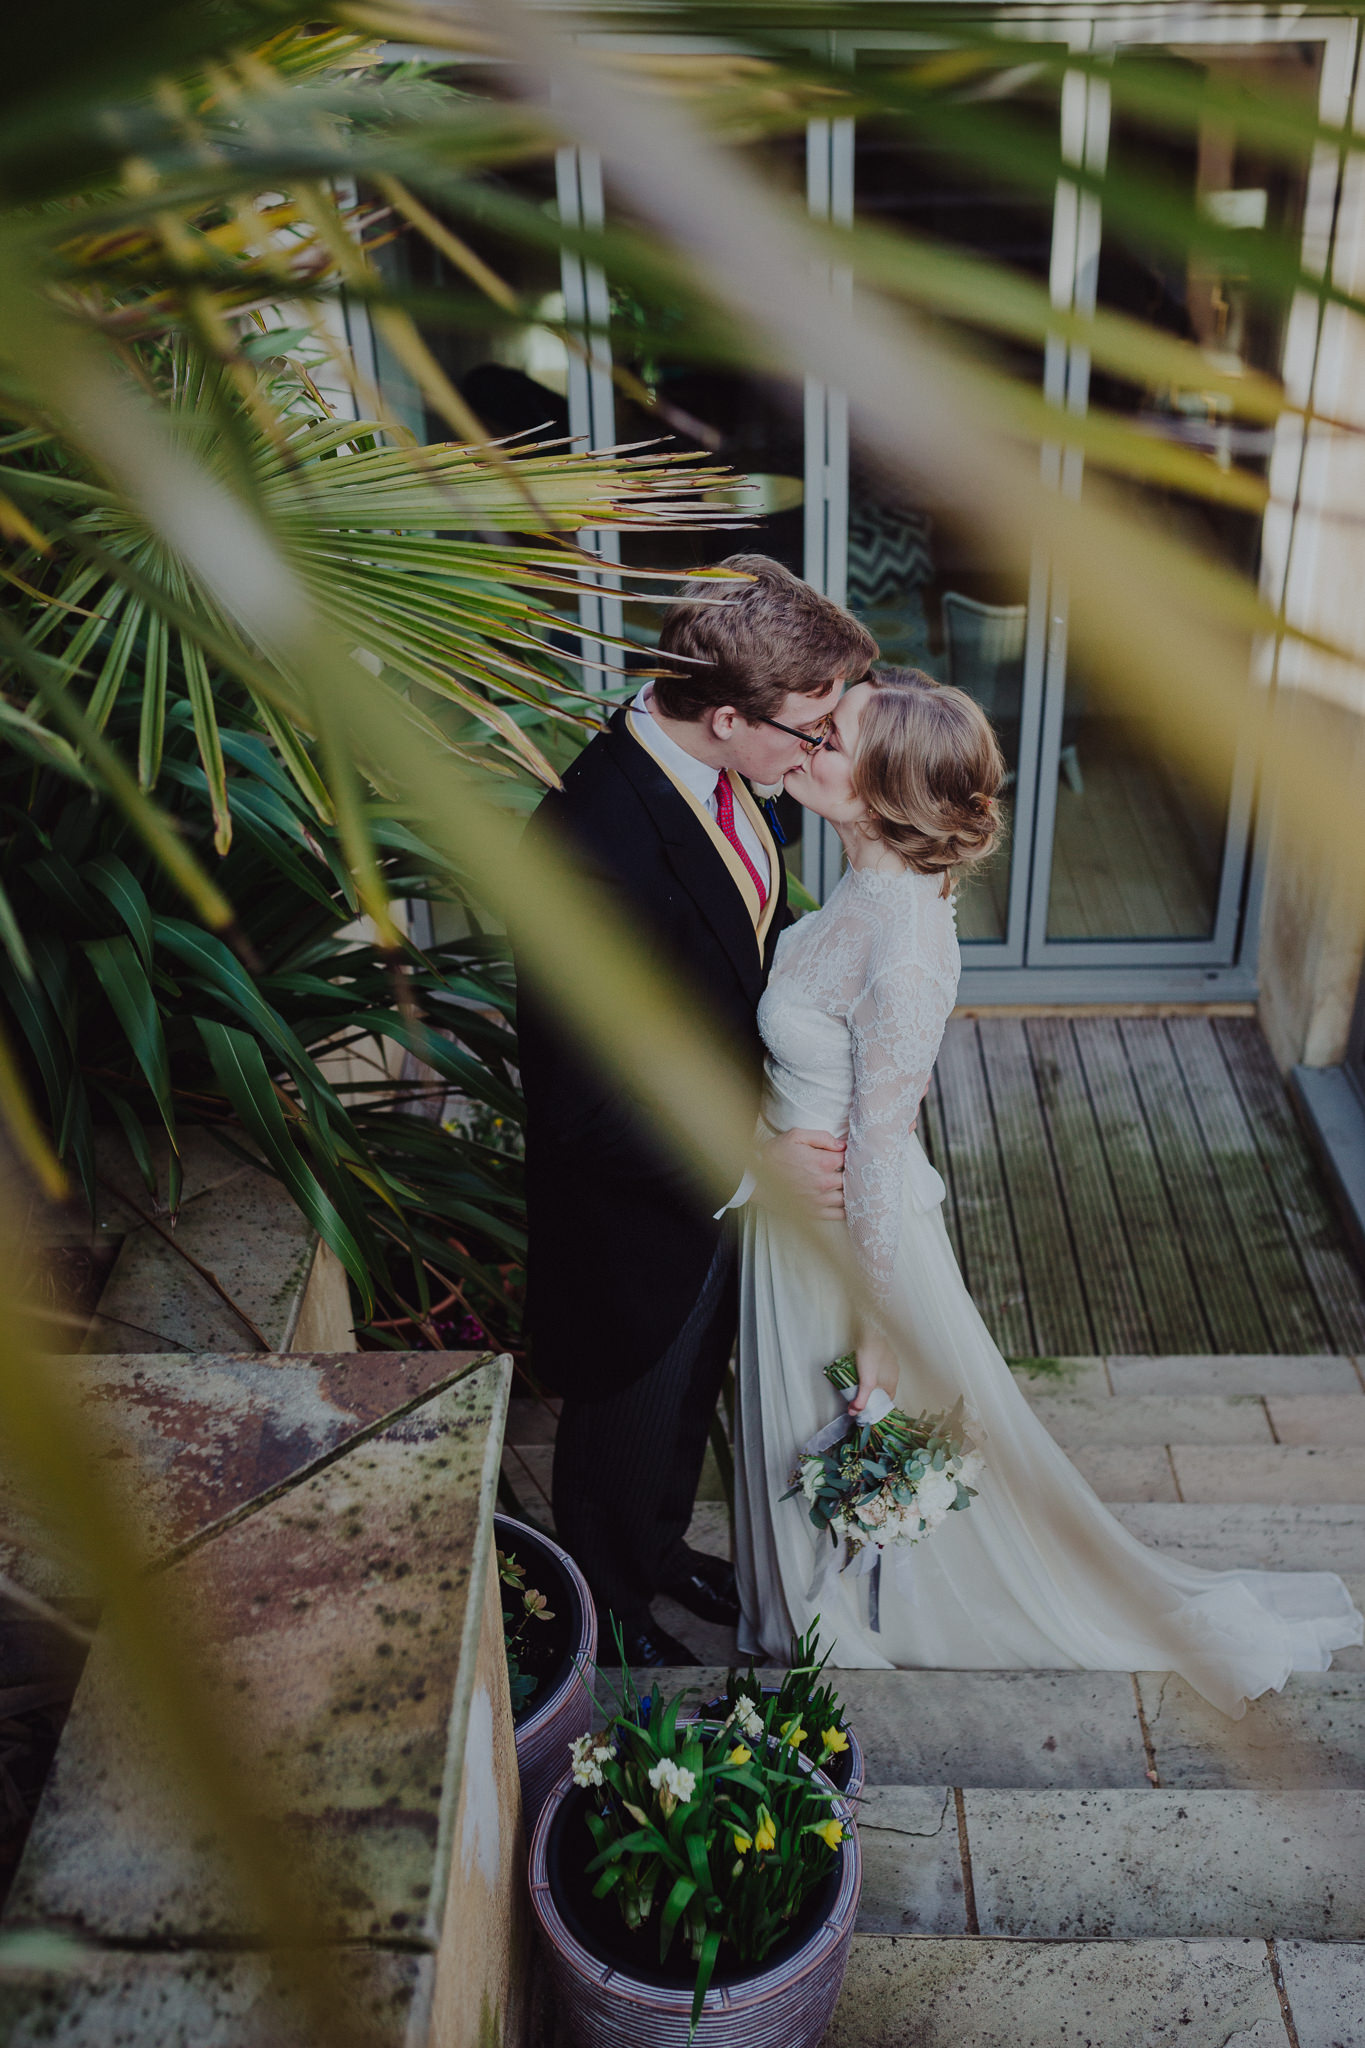 hampstead_wedding_photography_kate_gray-17.jpg